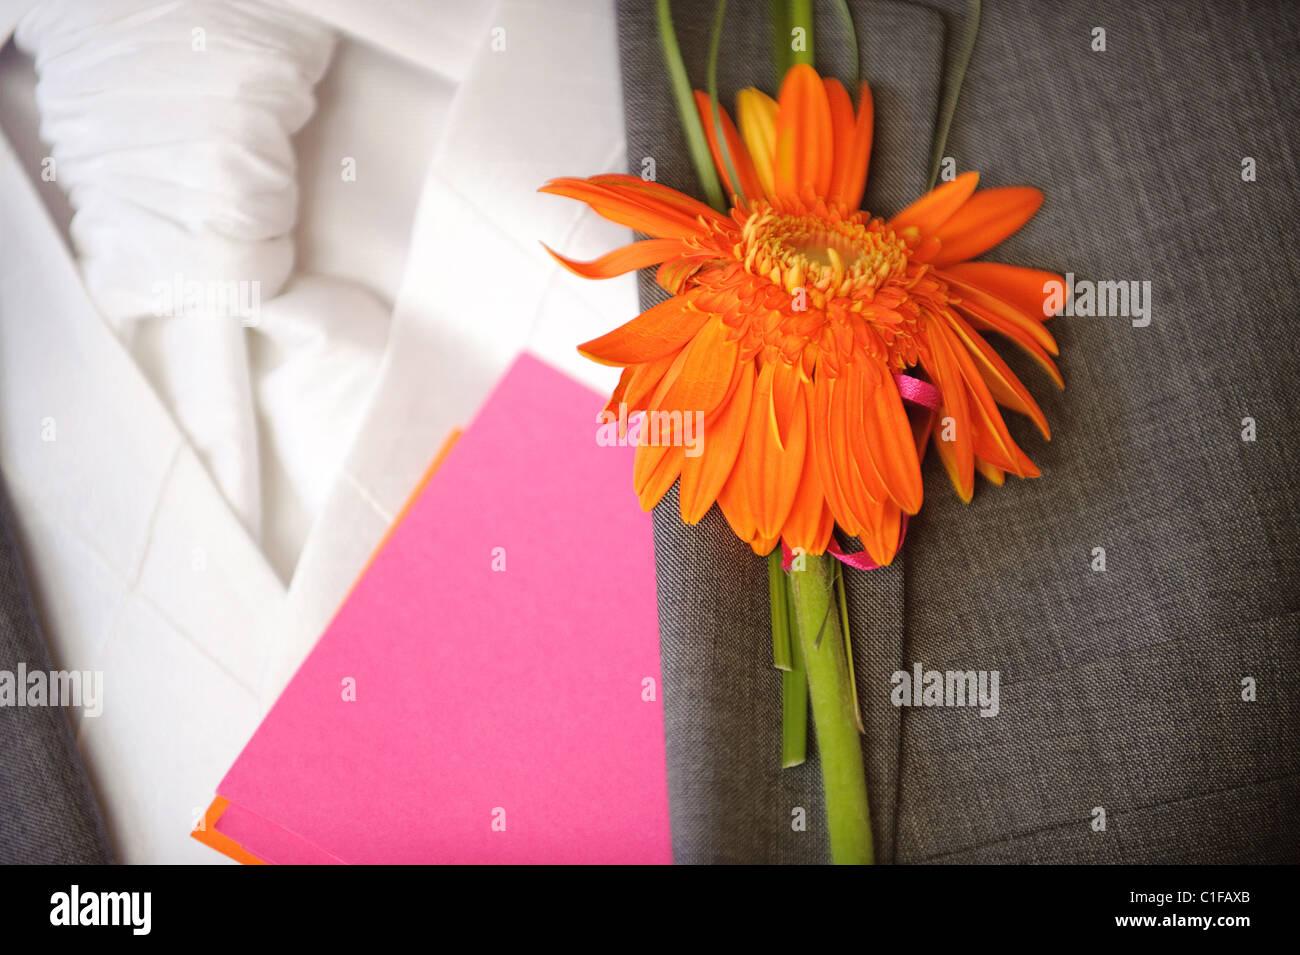 Mens Man Wedding Buttonhole Orange Flower Suit Jacket Collar